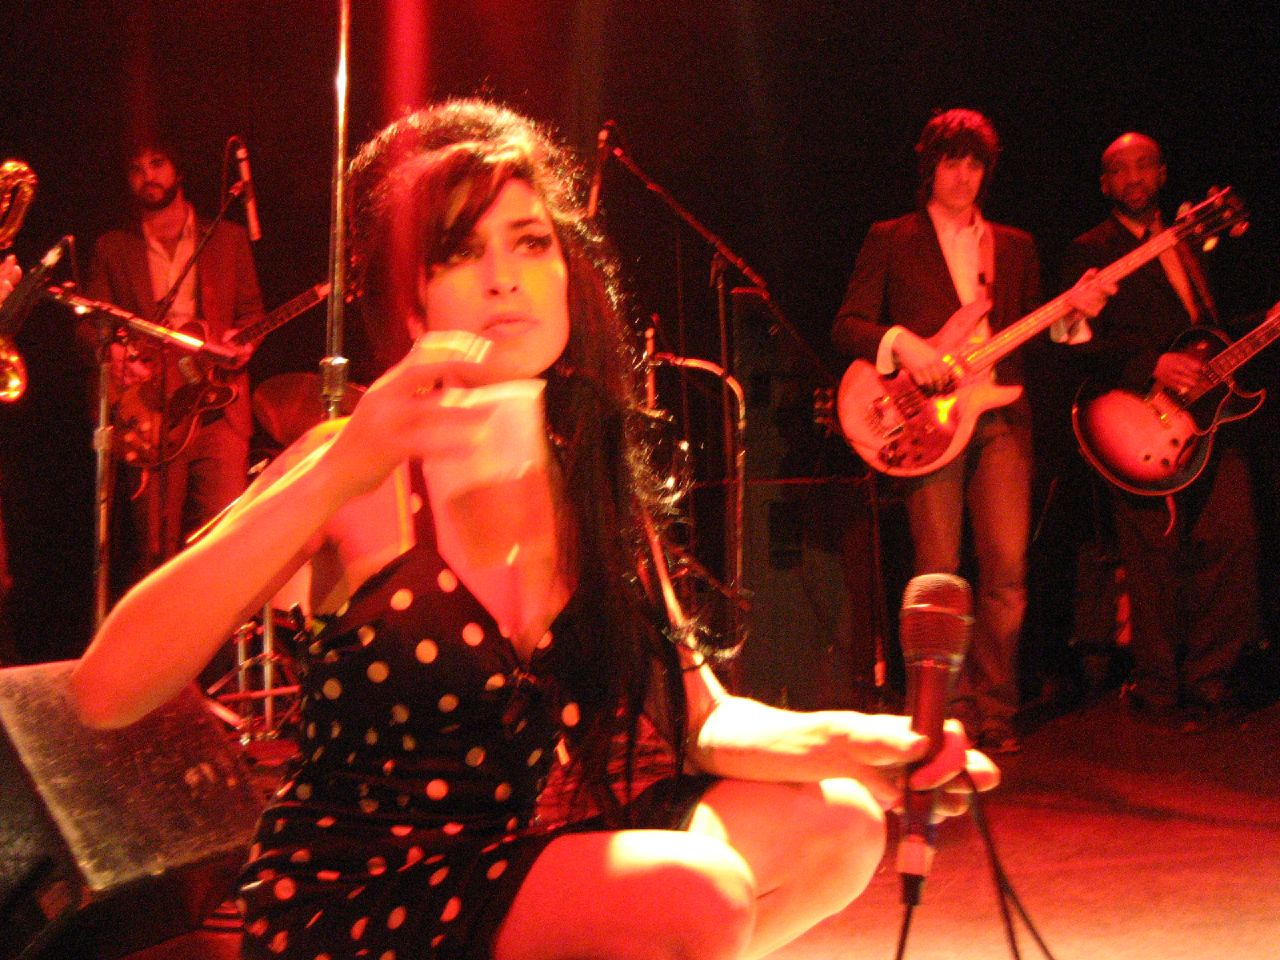 http://4.bp.blogspot.com/-92od54Db8Zo/TistFEkQITI/AAAAAAAABZE/mkRMLz_UBzM/s1600/Amy_Winehouse_.jpg